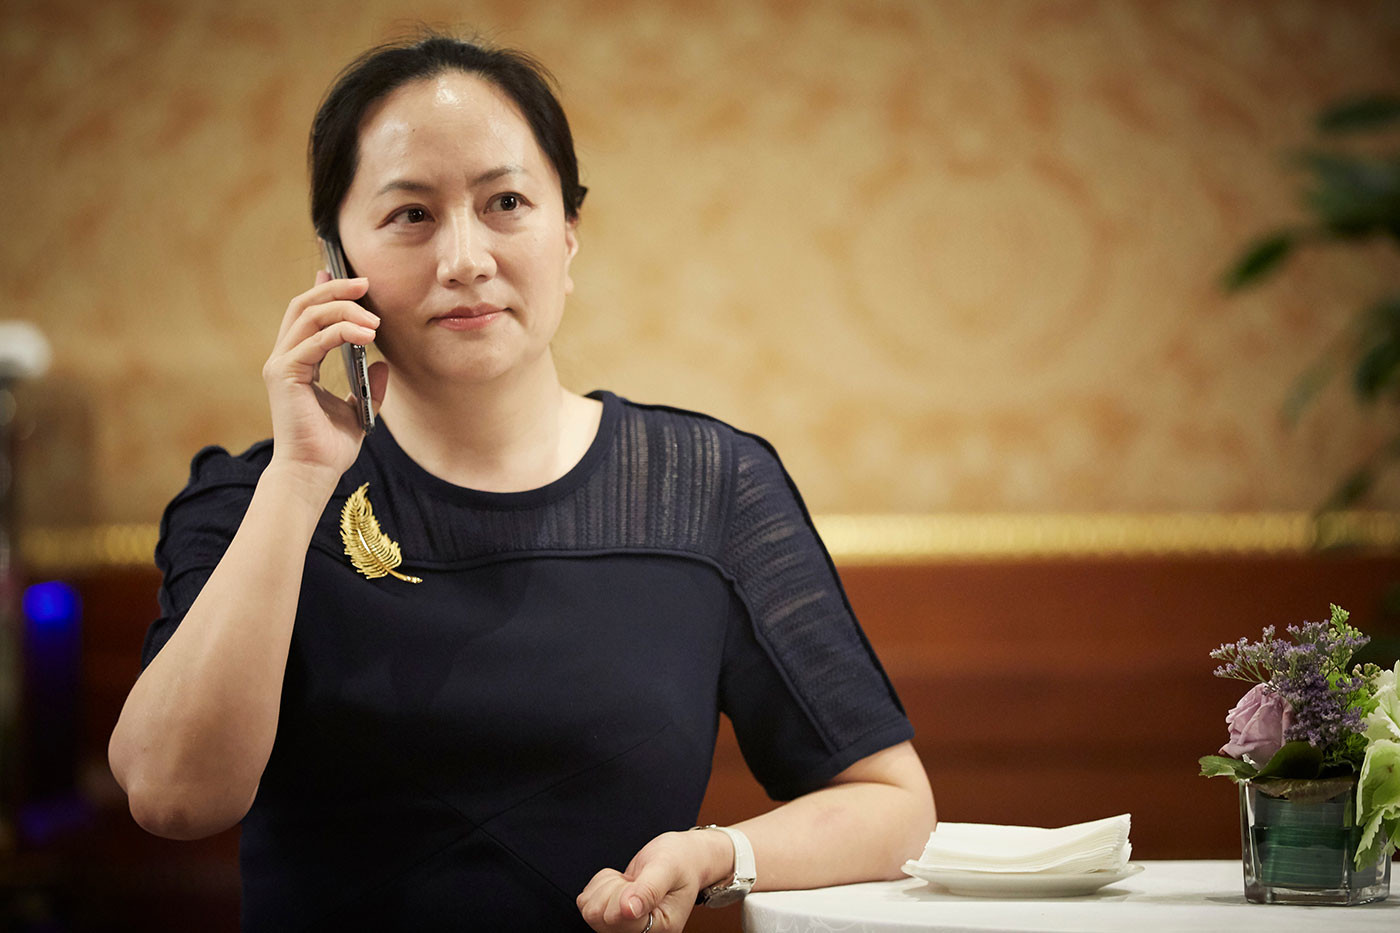 Директор Huawei Мэн Ваньчжоу. Фото © Shutterstock